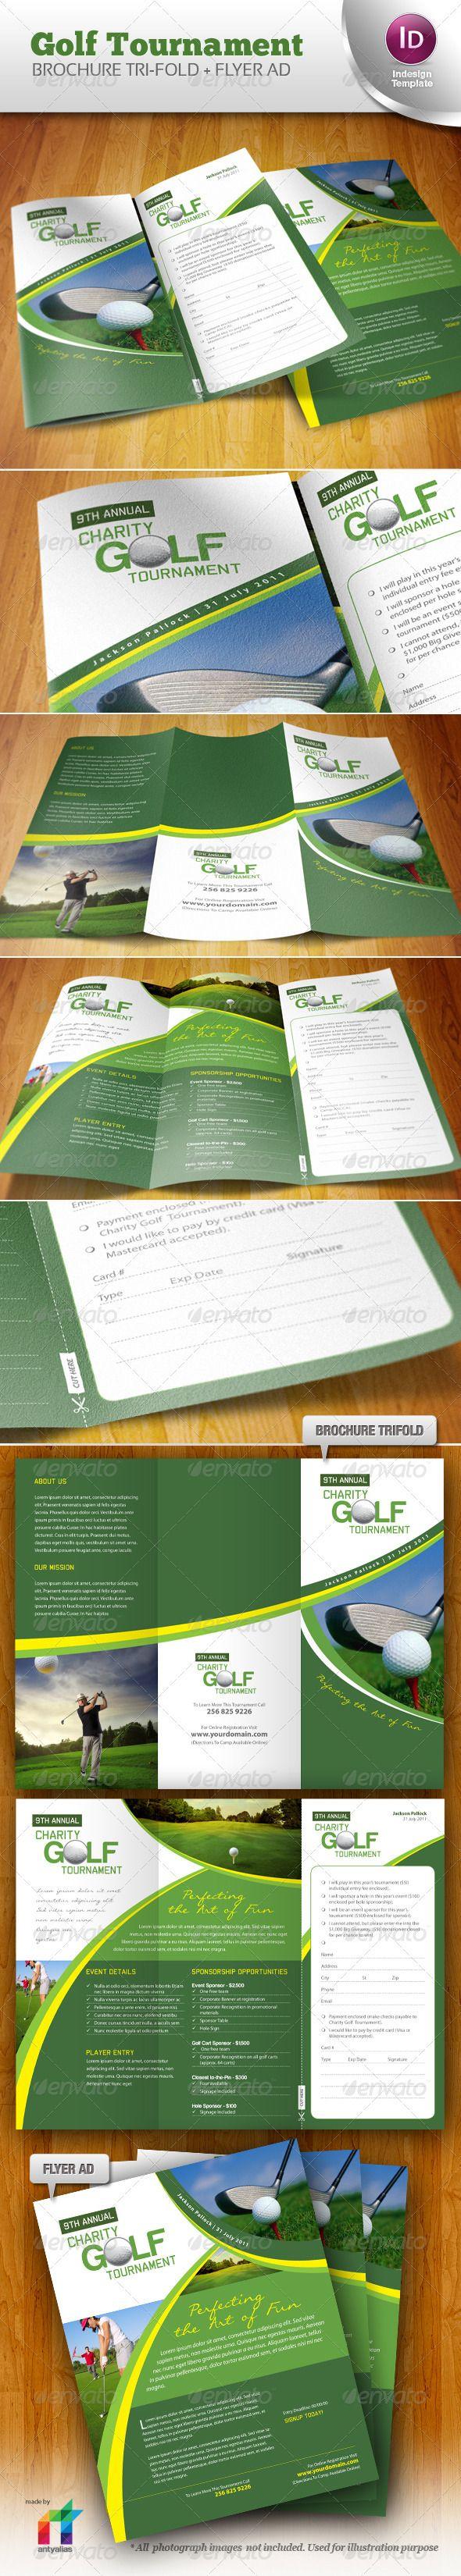 Golf Tournament Brochure Trifold